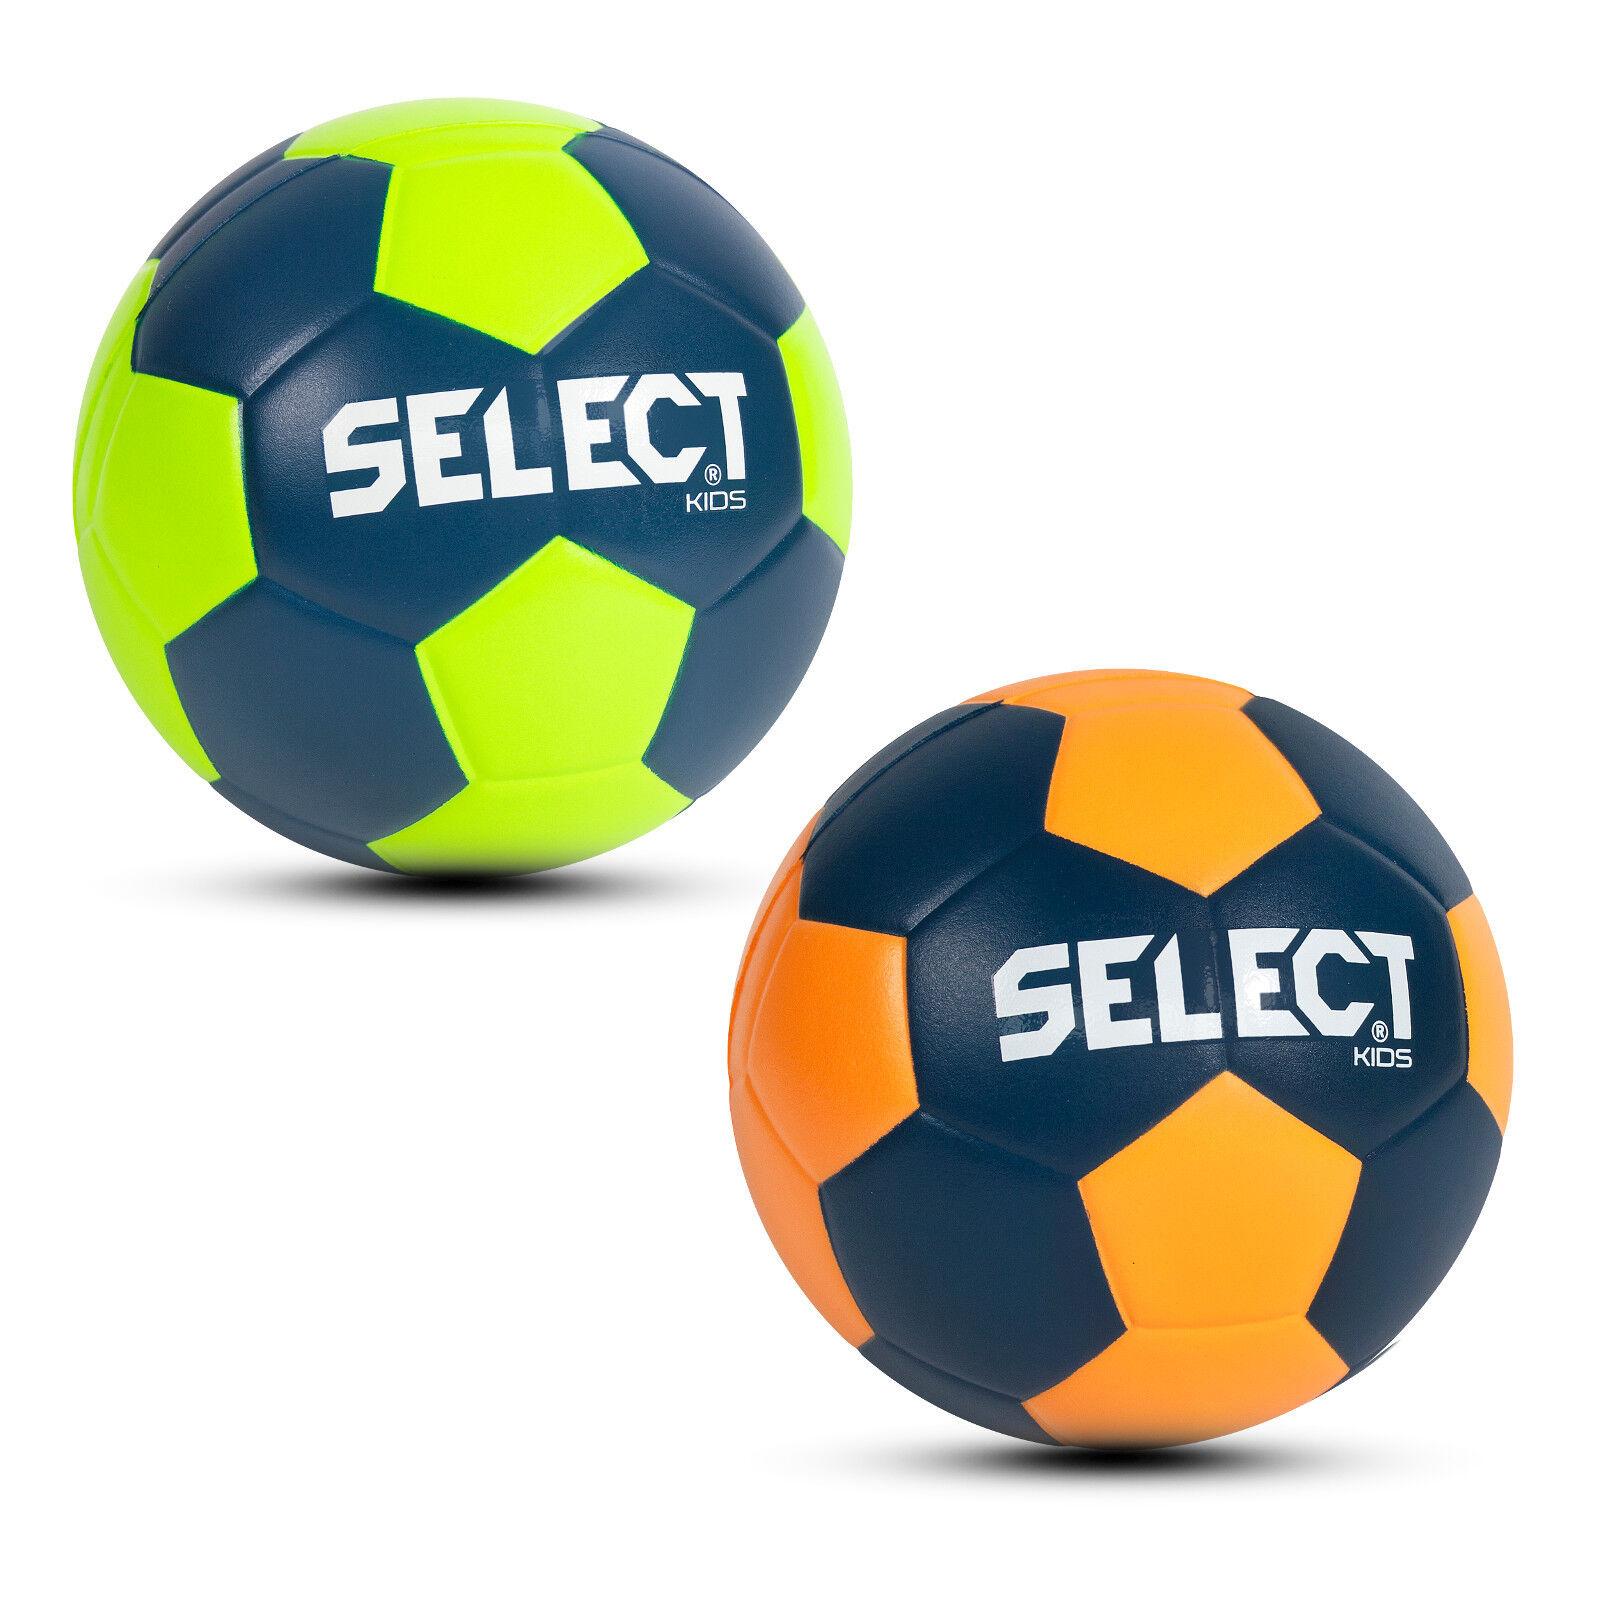 Select Kids III Kinder Handball Schaumstoff Gr. 0 Softball Training Spielball